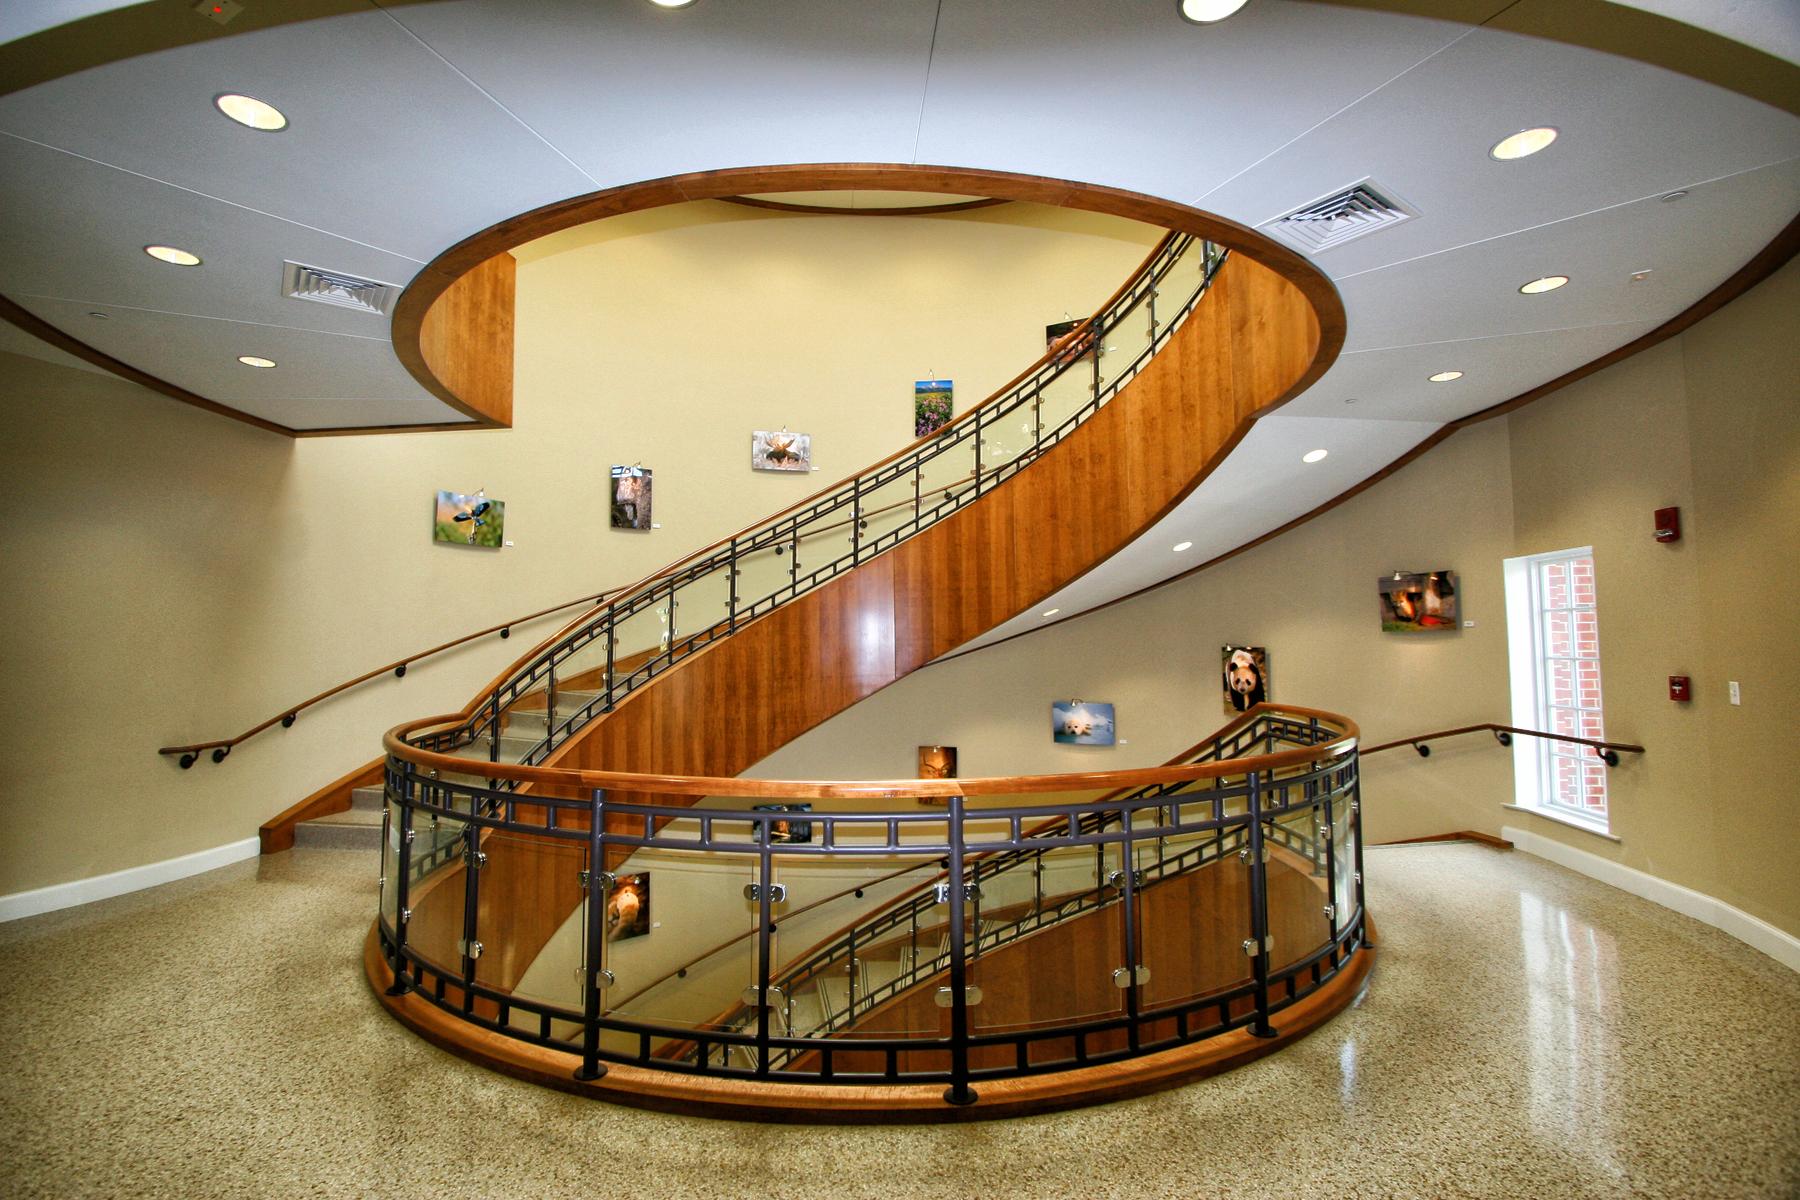 EDU_St Marys WSM Bldg_Staircase03_RGB_HR.jpg